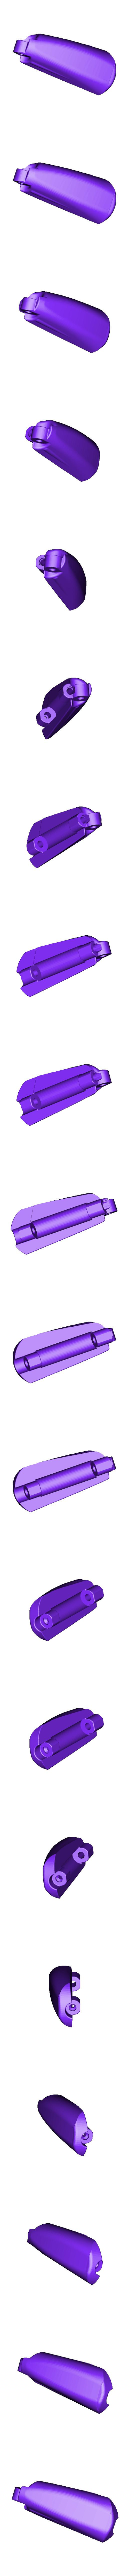 base_m%C3%A9tacarpes_-_auriculaire__.stl Download free STL file Articulated hand • 3D printer model, NOP21